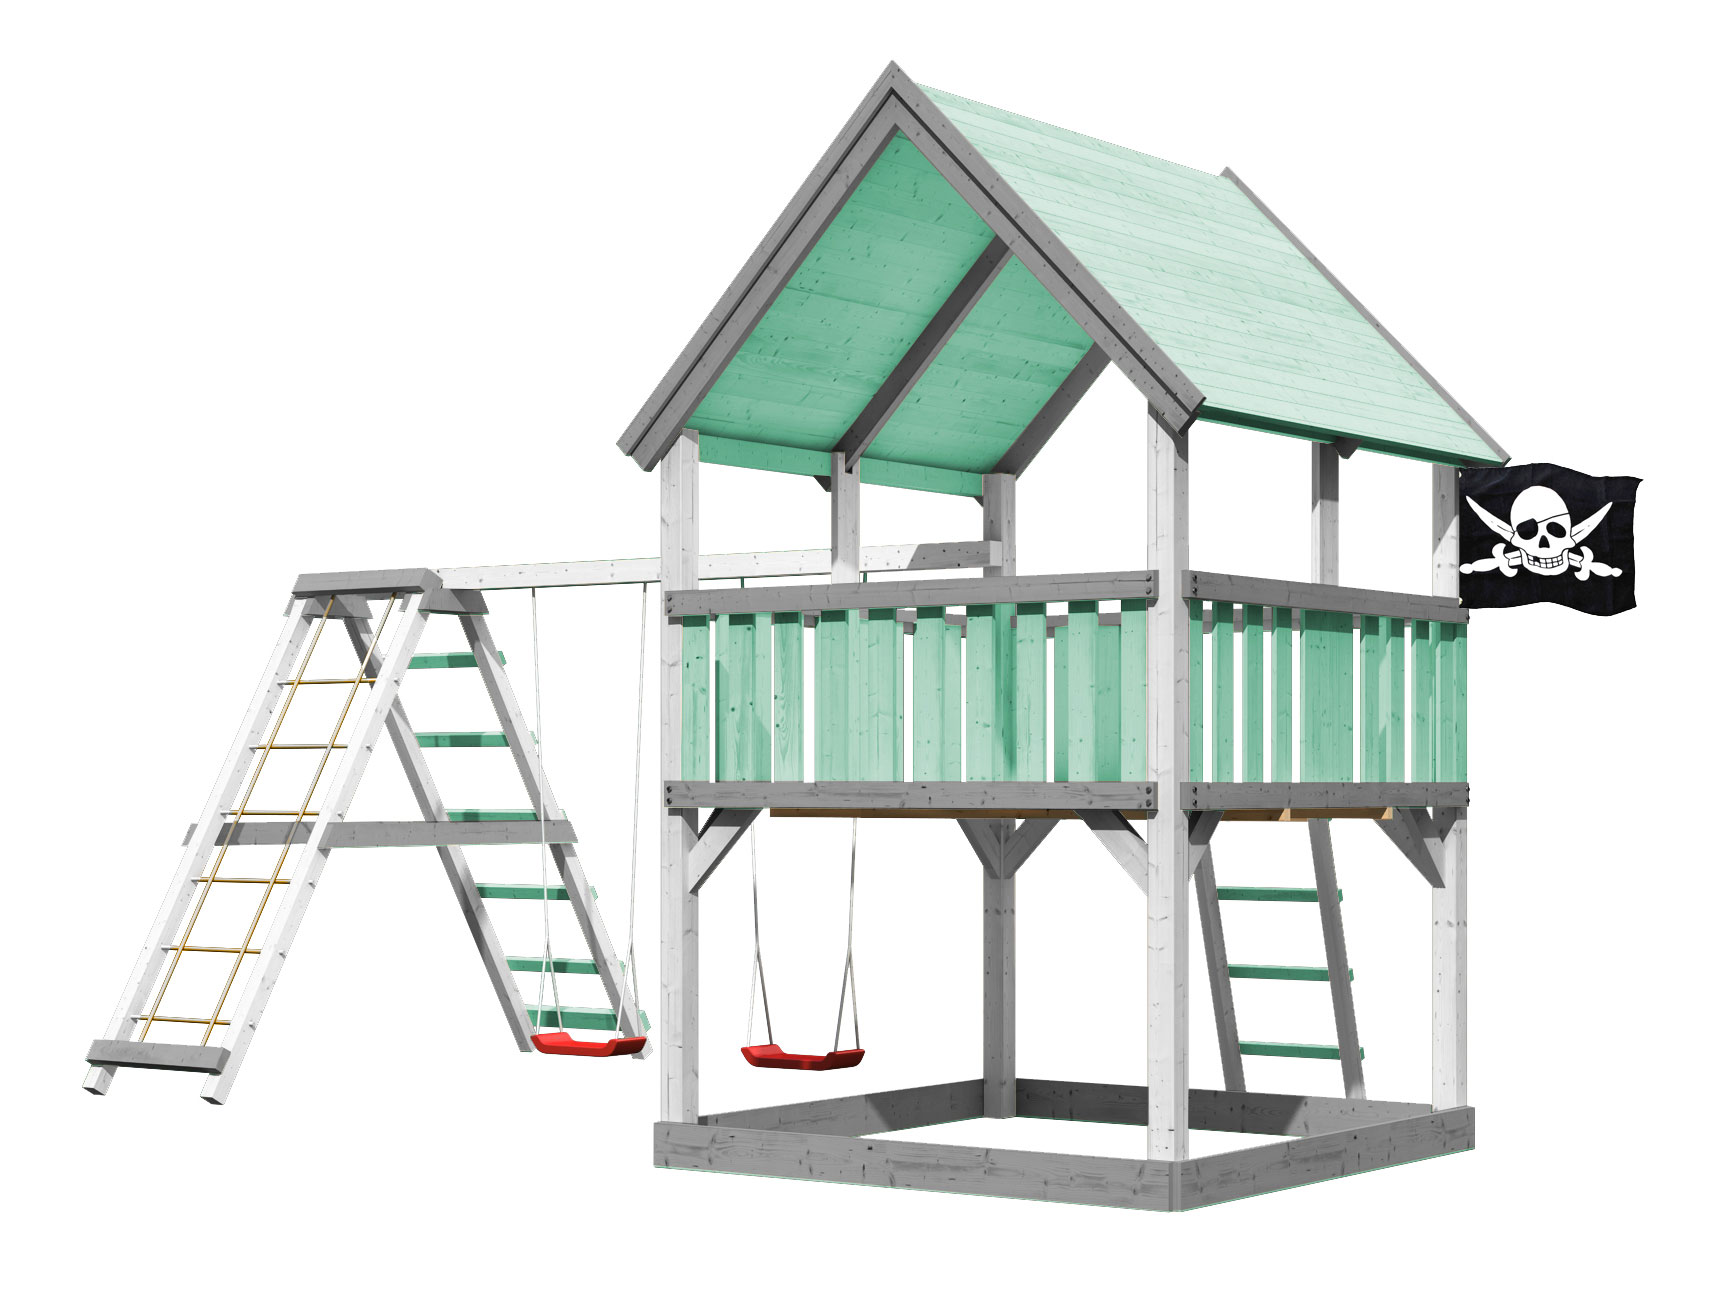 Spielturm Karibu Akubi Piraten-Festung + Doppelschaukel +Klettergerüst Bild 1